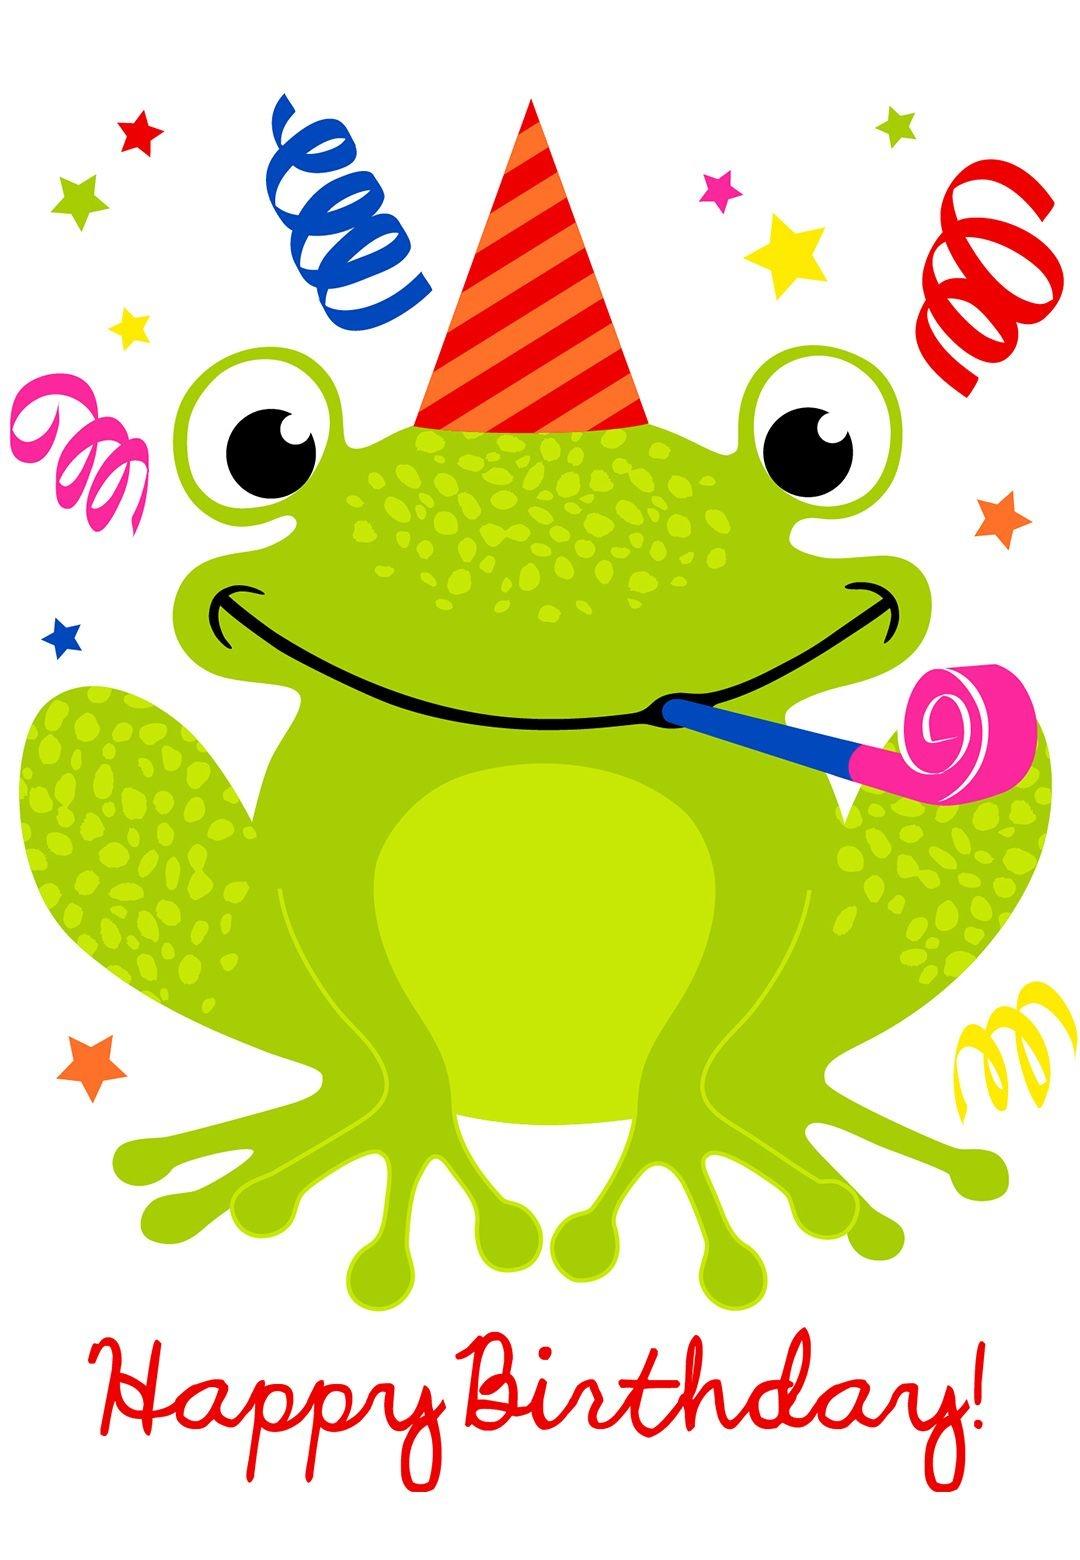 Free Printable A Happy Hopping Birthday Greeting Card #birthday - Birthday Clipart Free Printable